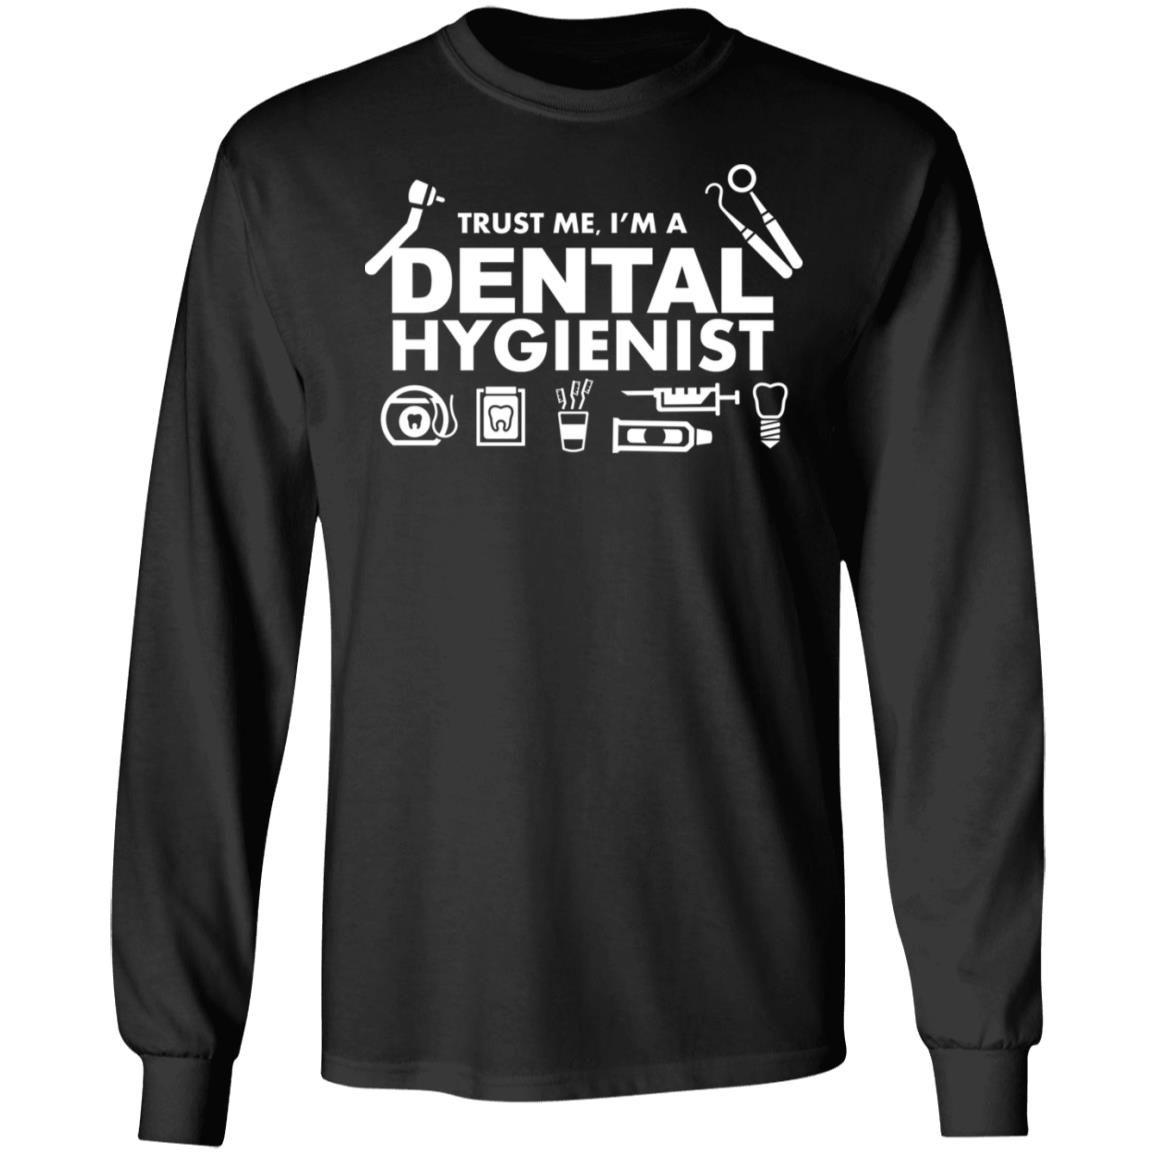 Trust Me I'm A Dental Hygienist shirt